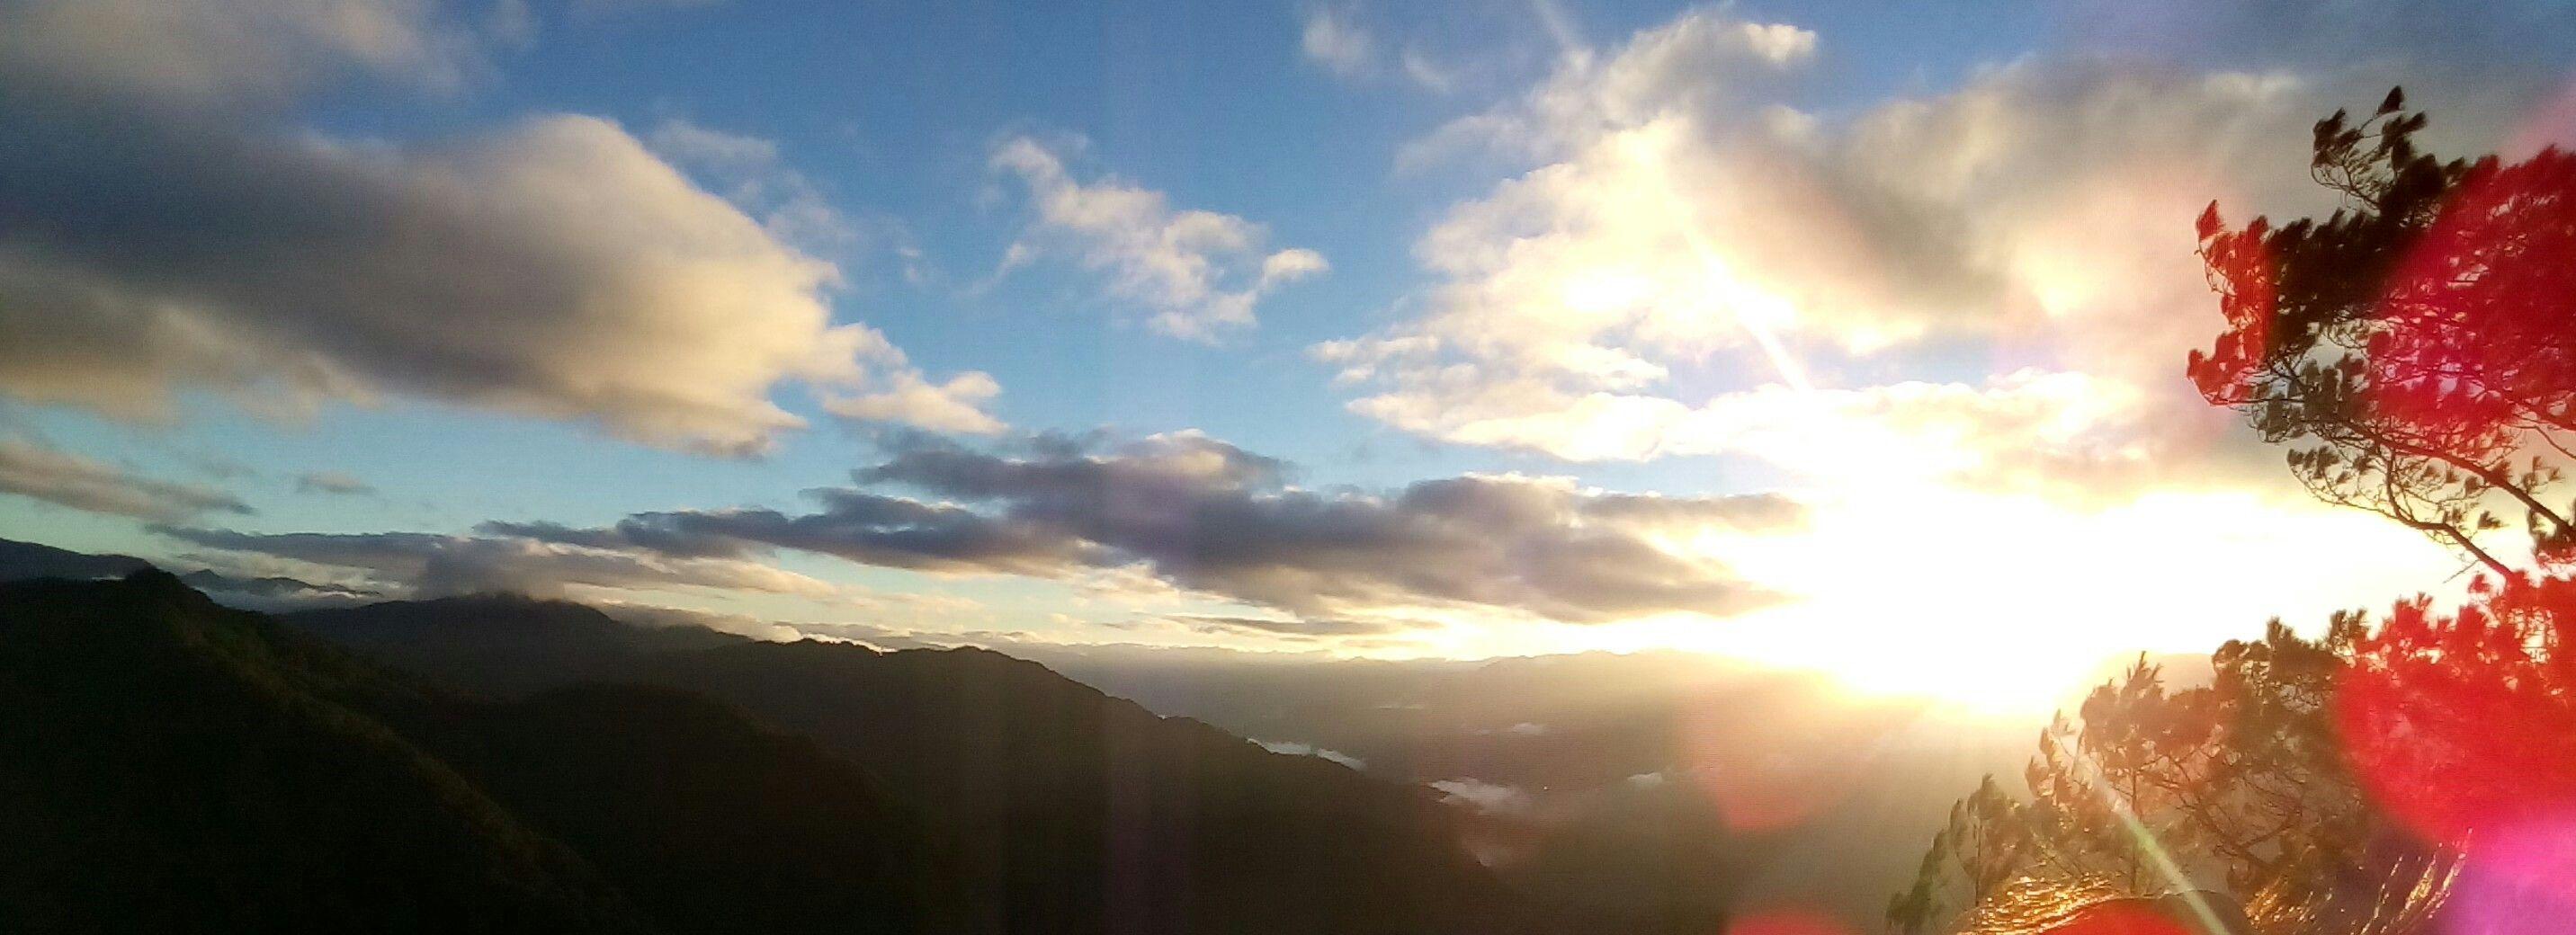 kiltipan sunrise